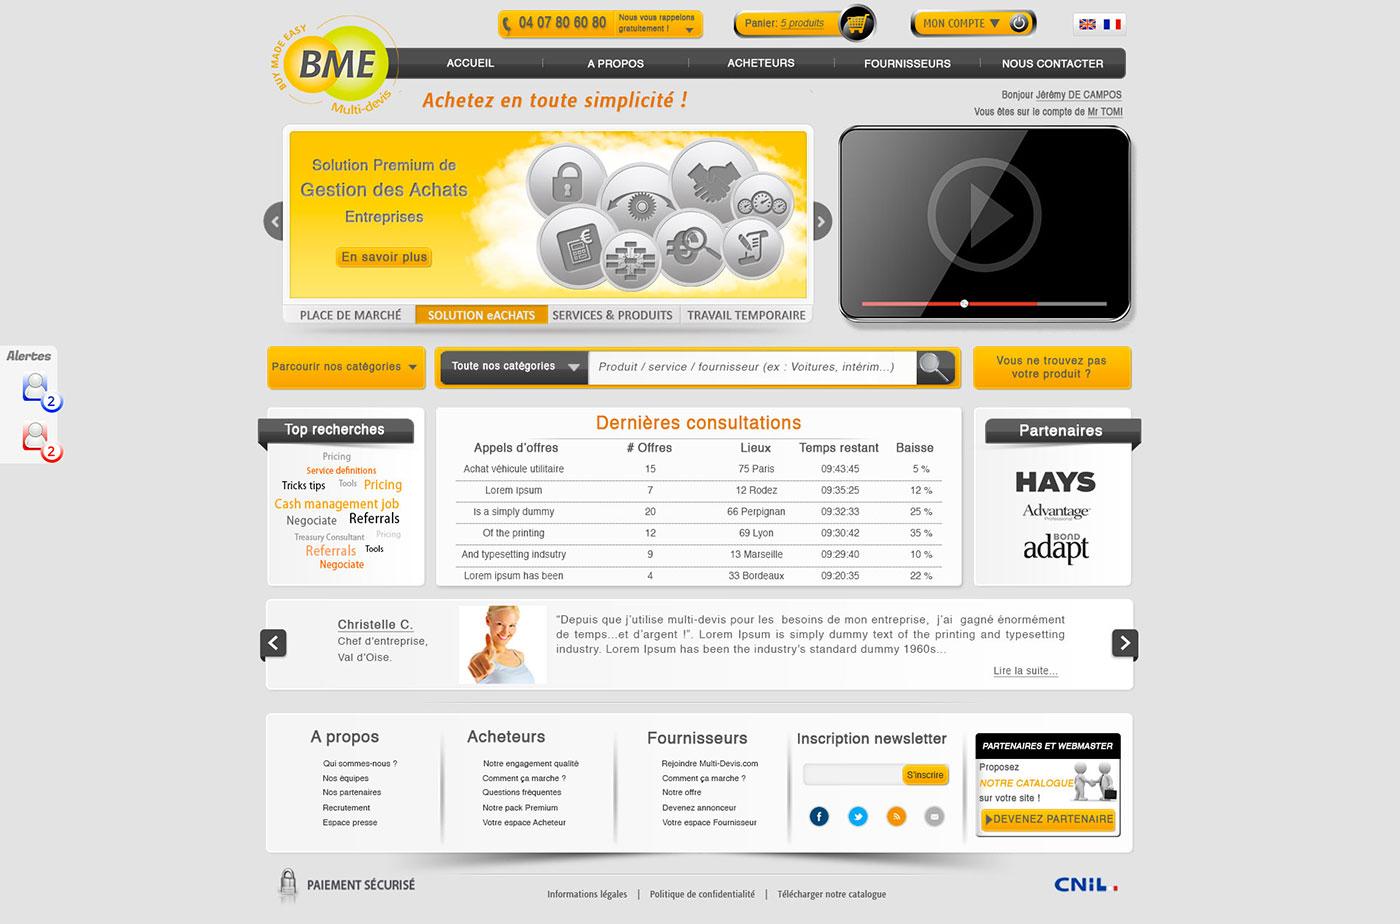 cr ation site internet de multi devis agence point com perpignan. Black Bedroom Furniture Sets. Home Design Ideas